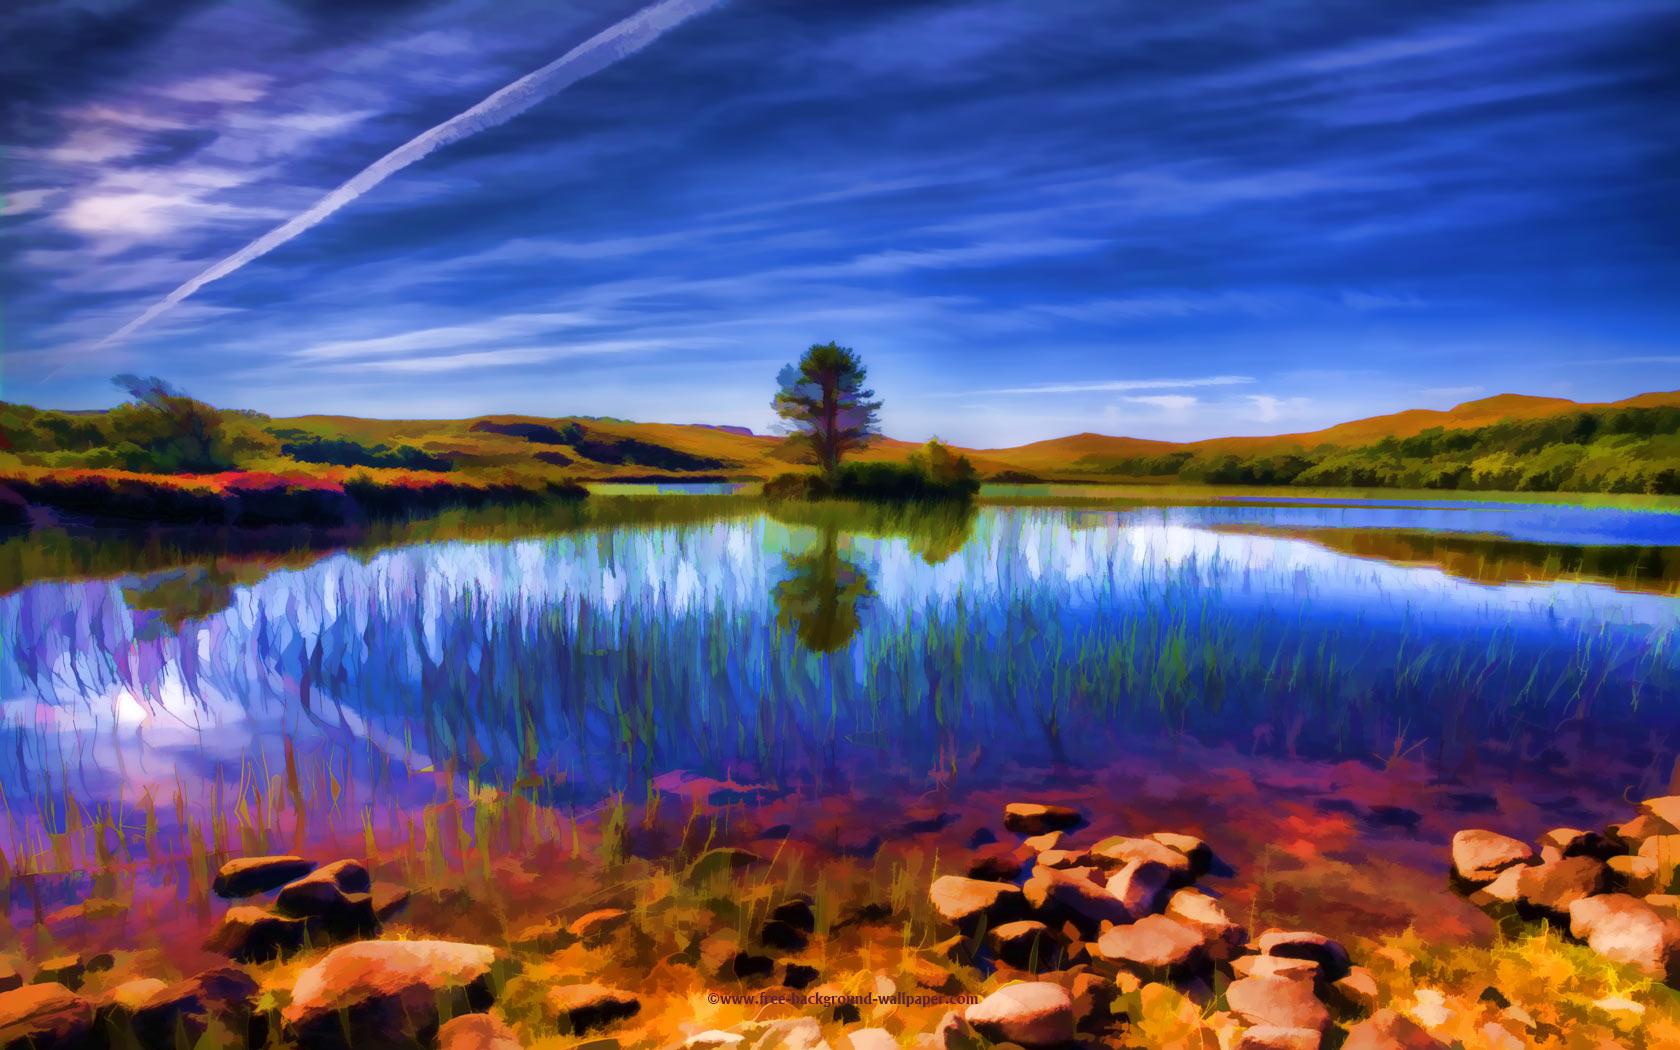 Widescreen Wallpapers Beautiful Summer Scenery 1920 X 1200 1467 Kb 1680x1050